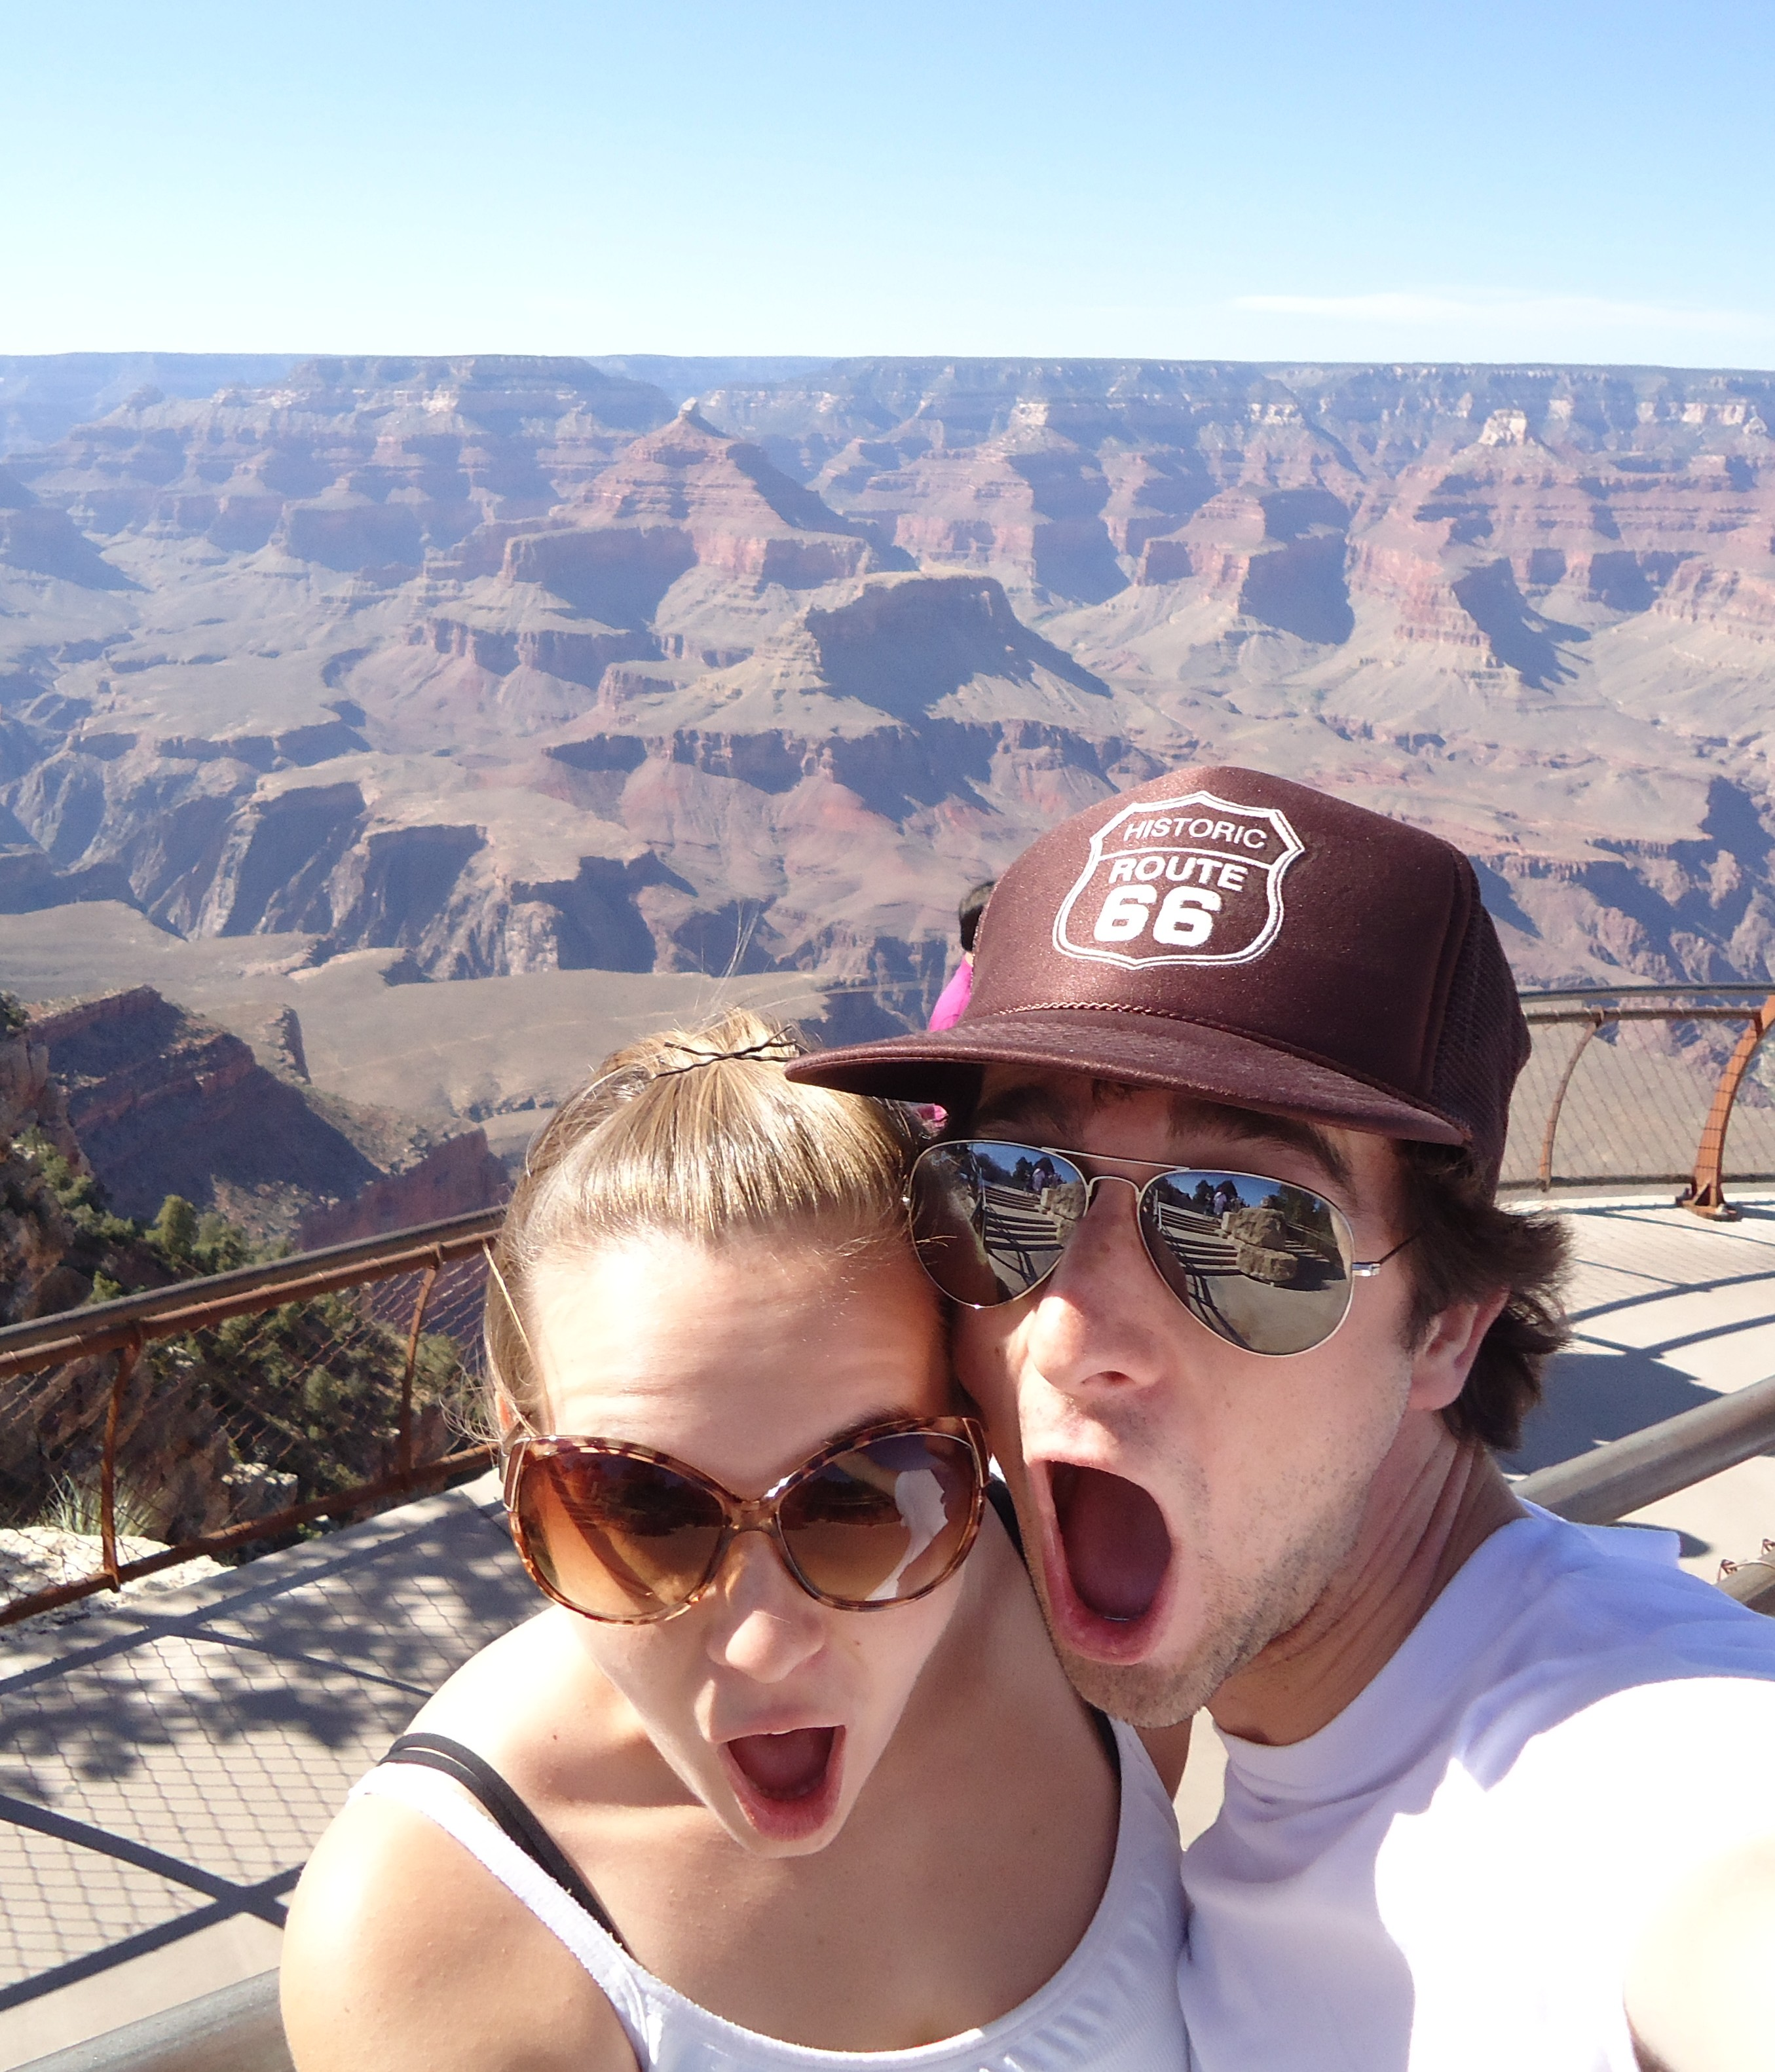 Grand Canyon: Isn't Life Grand!